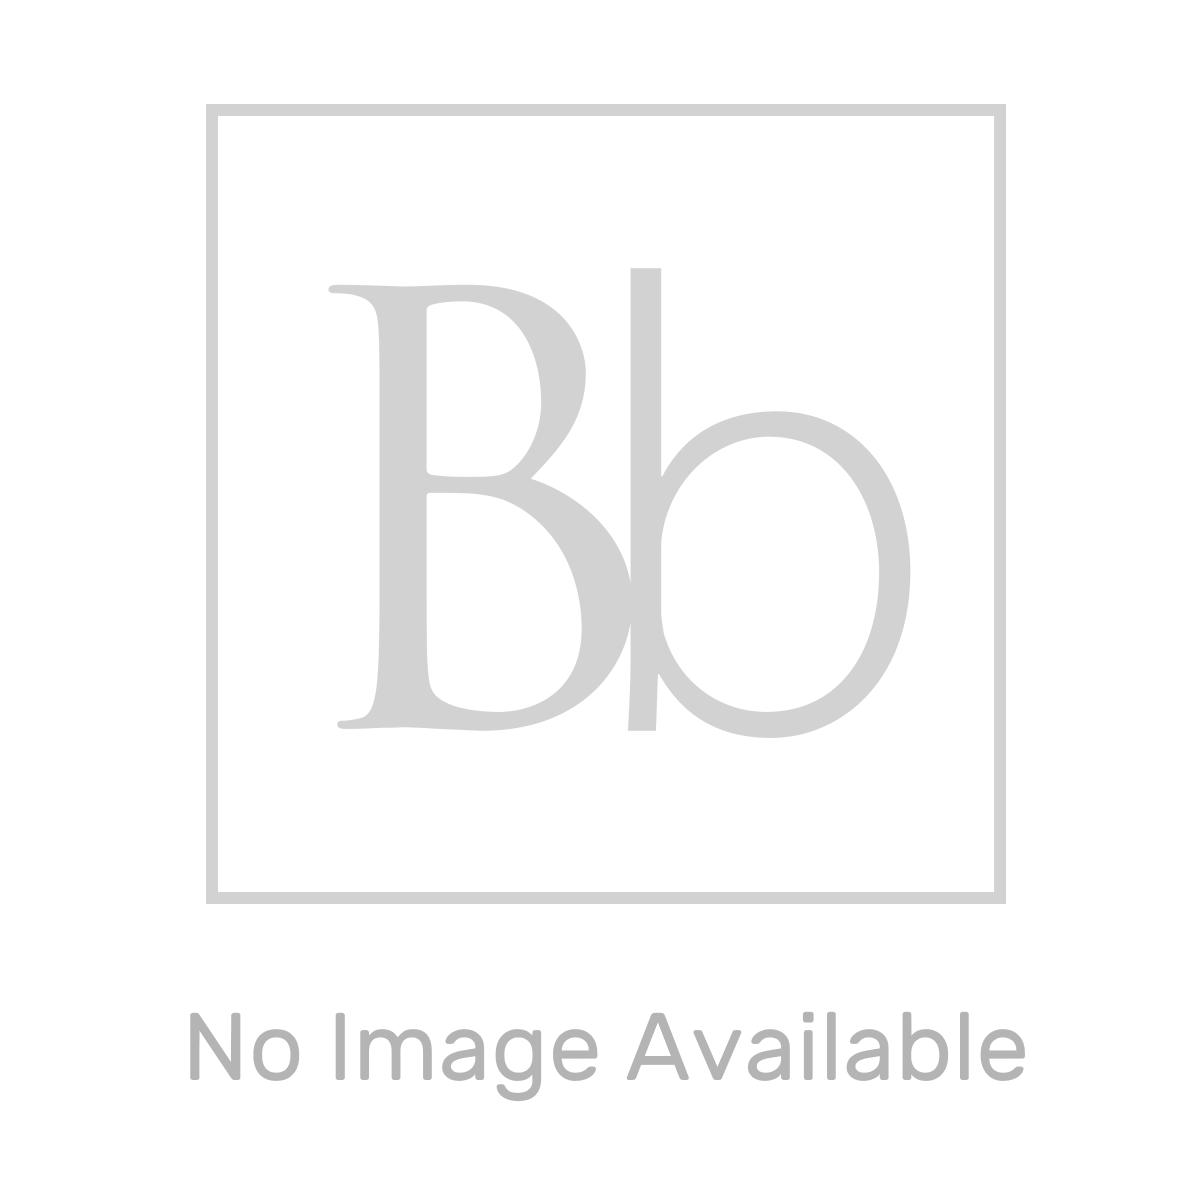 RAK Washington Grey Vanity Unit with Black Countertop 800mm Measurements